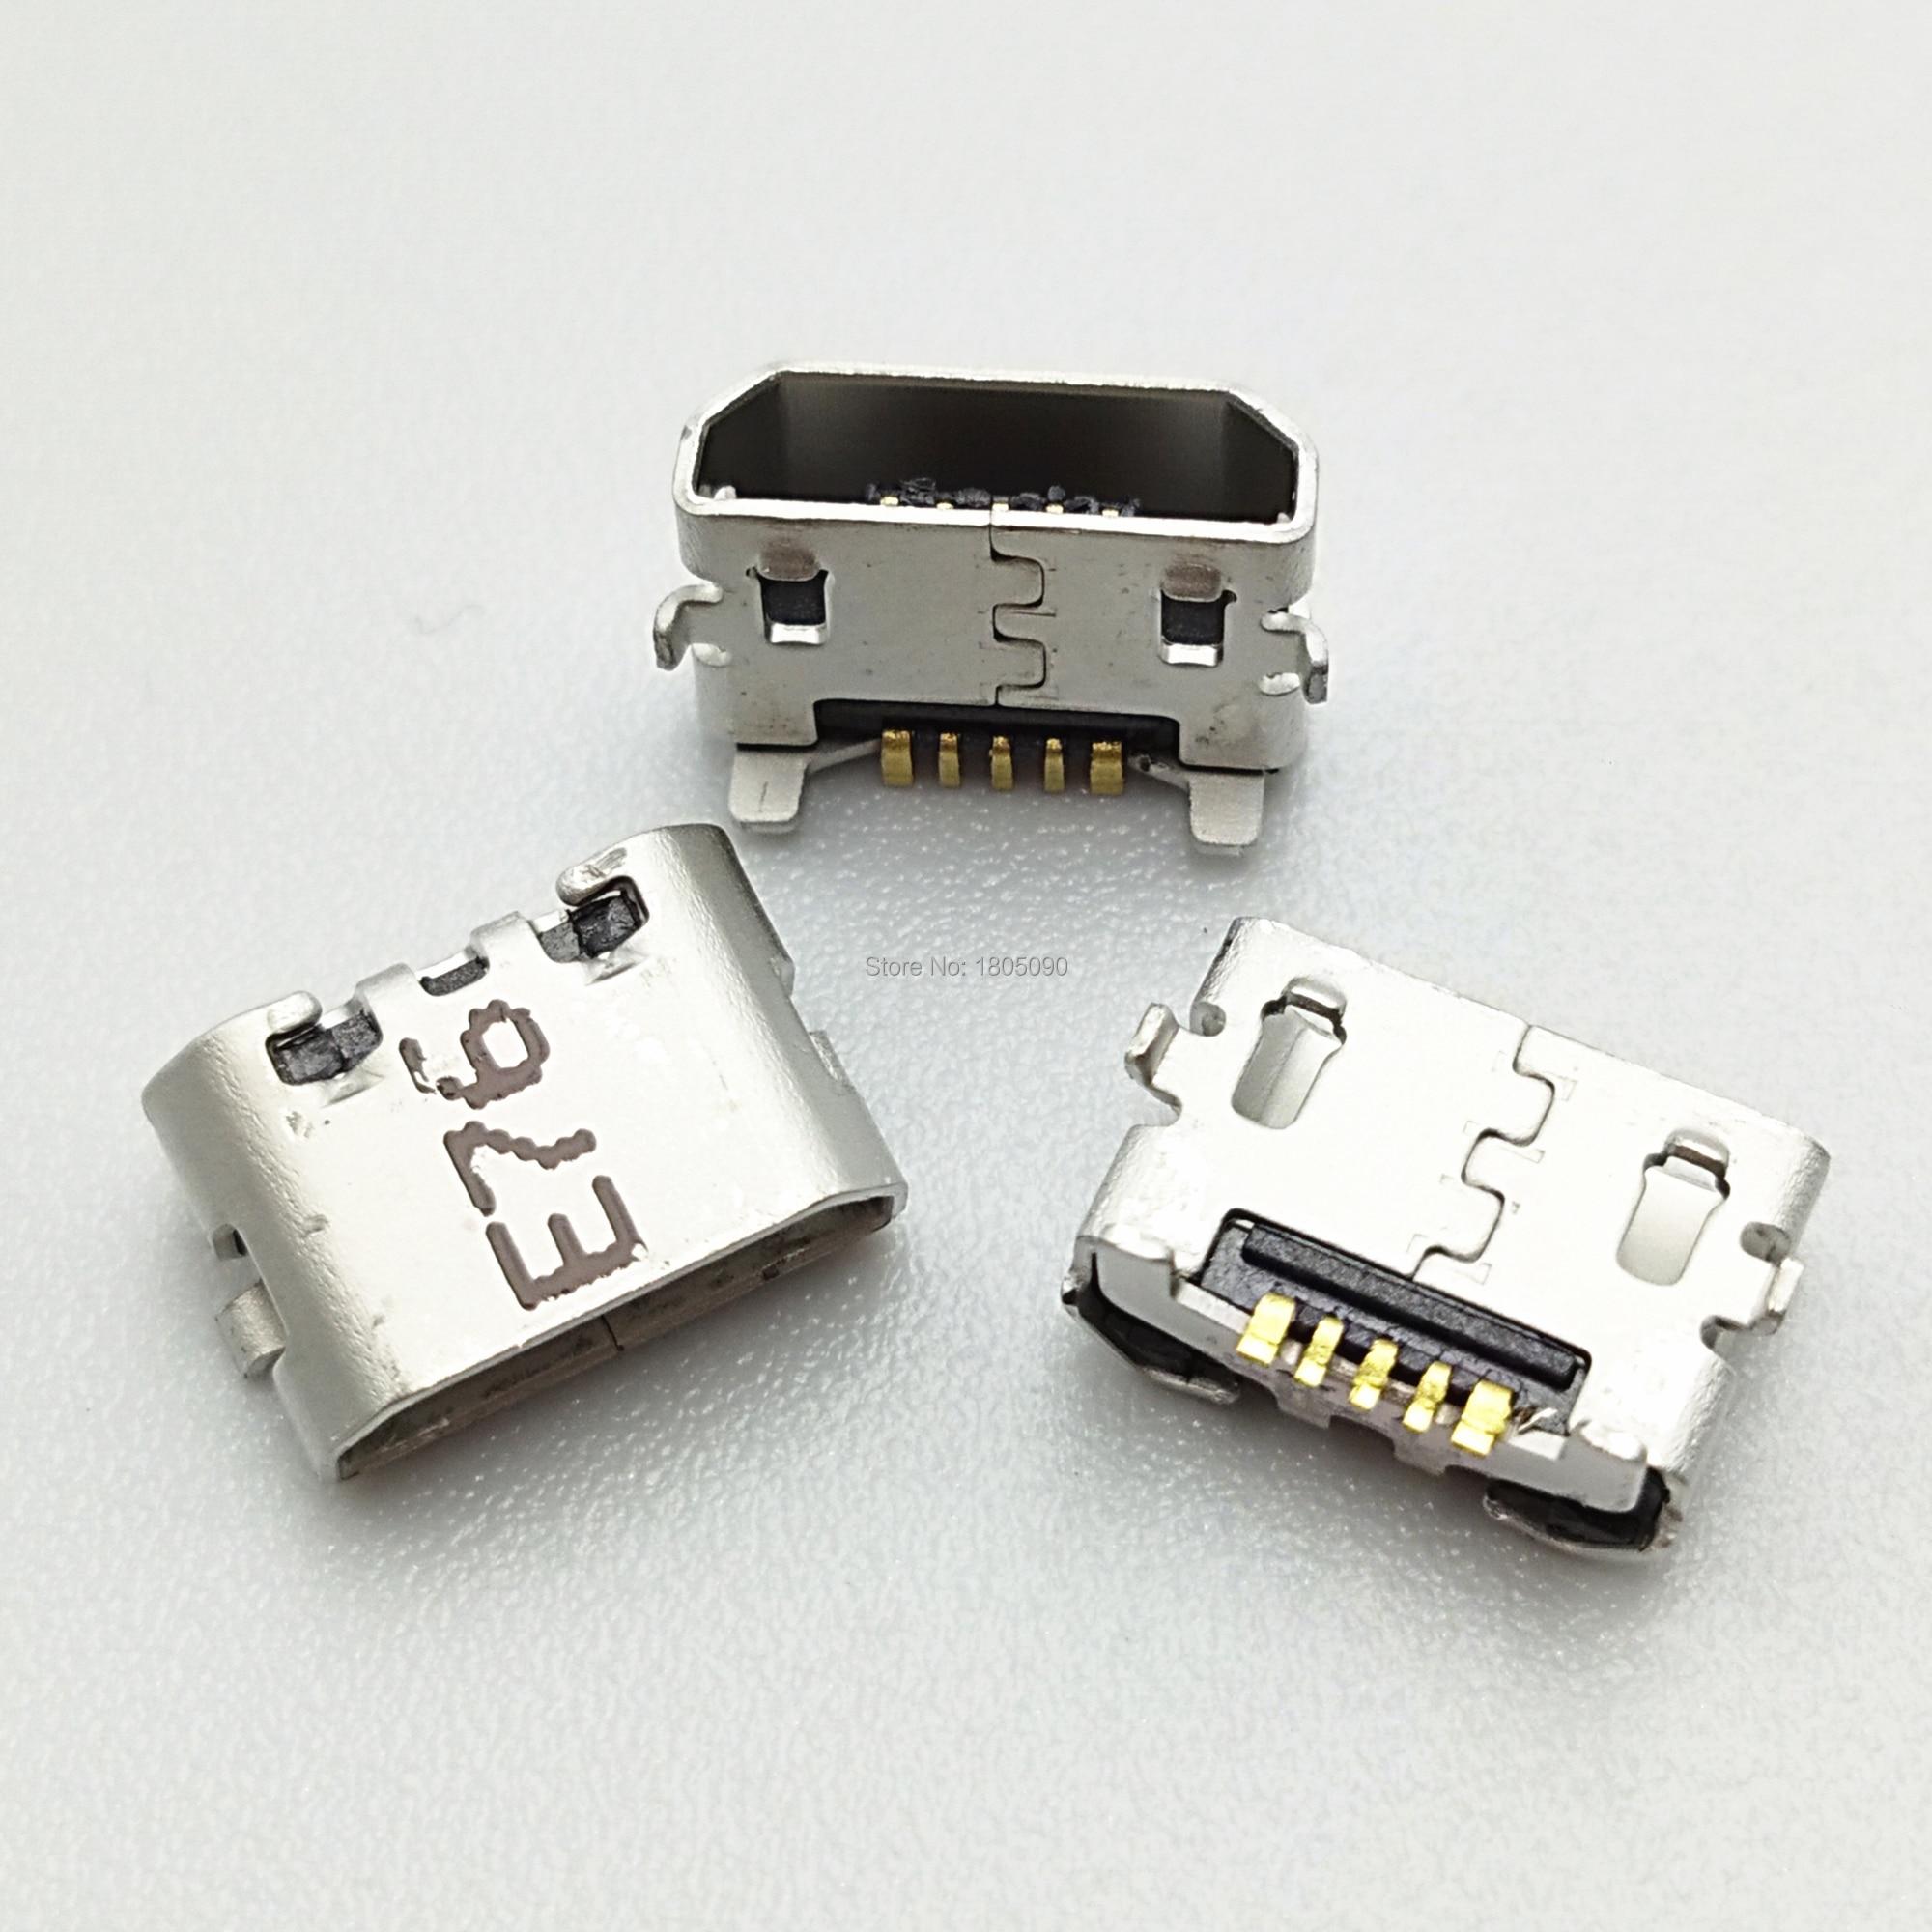 50 Uds puerto de carga micro USB conector hembra para Huawei Ascend 4X 4X Y6 4A P8 C8817 P8 max P8 Lite 4C 3X Pro G750-T20